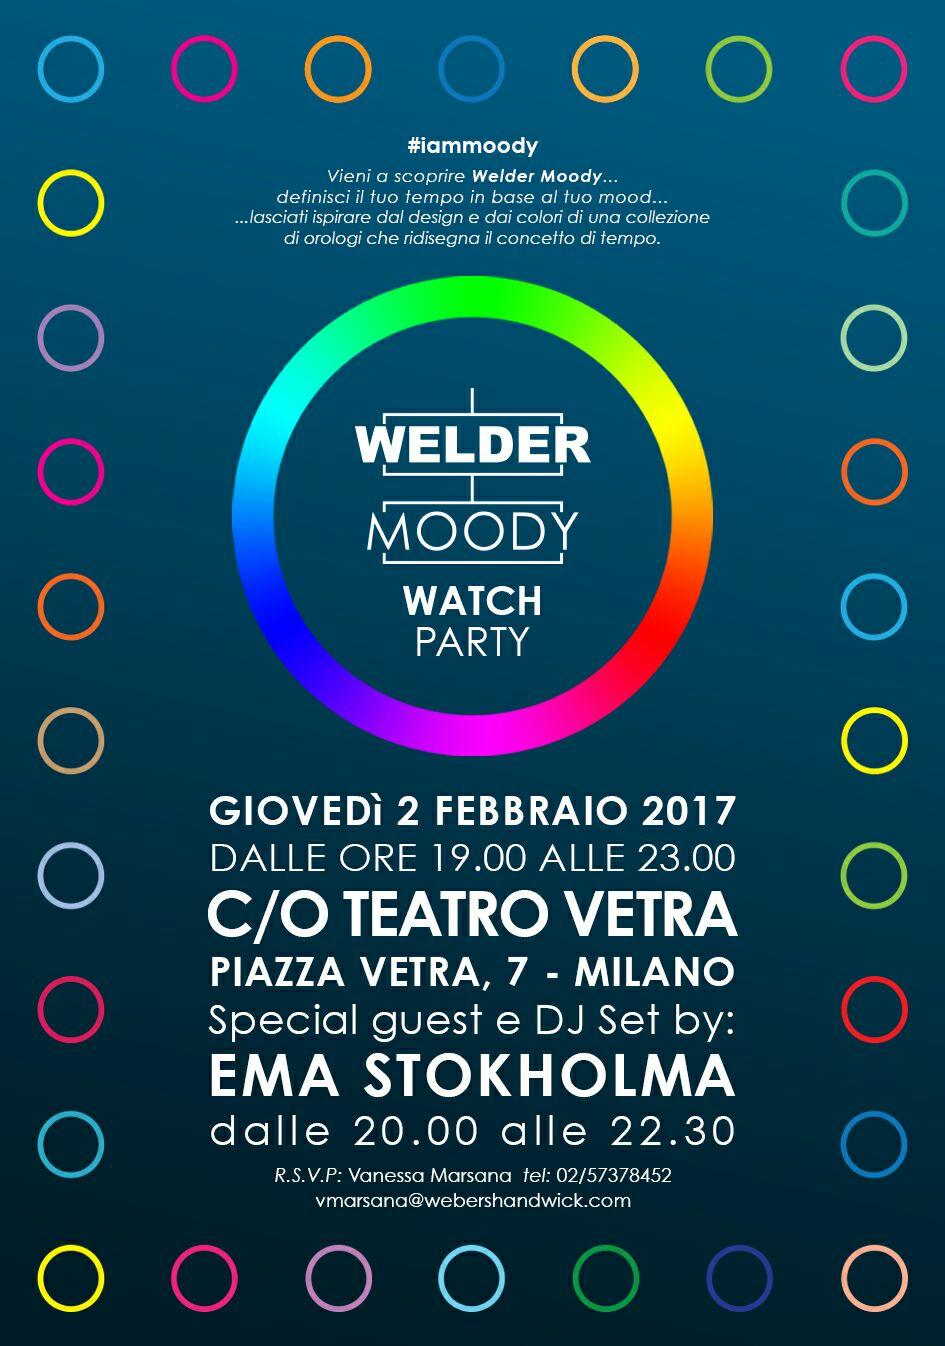 WELDER PRESENTA DUE NUOVE COLLEZIONI DI OROLOGI » iammoody welder moody  watches 2017 02 02 at milan teatro vetra